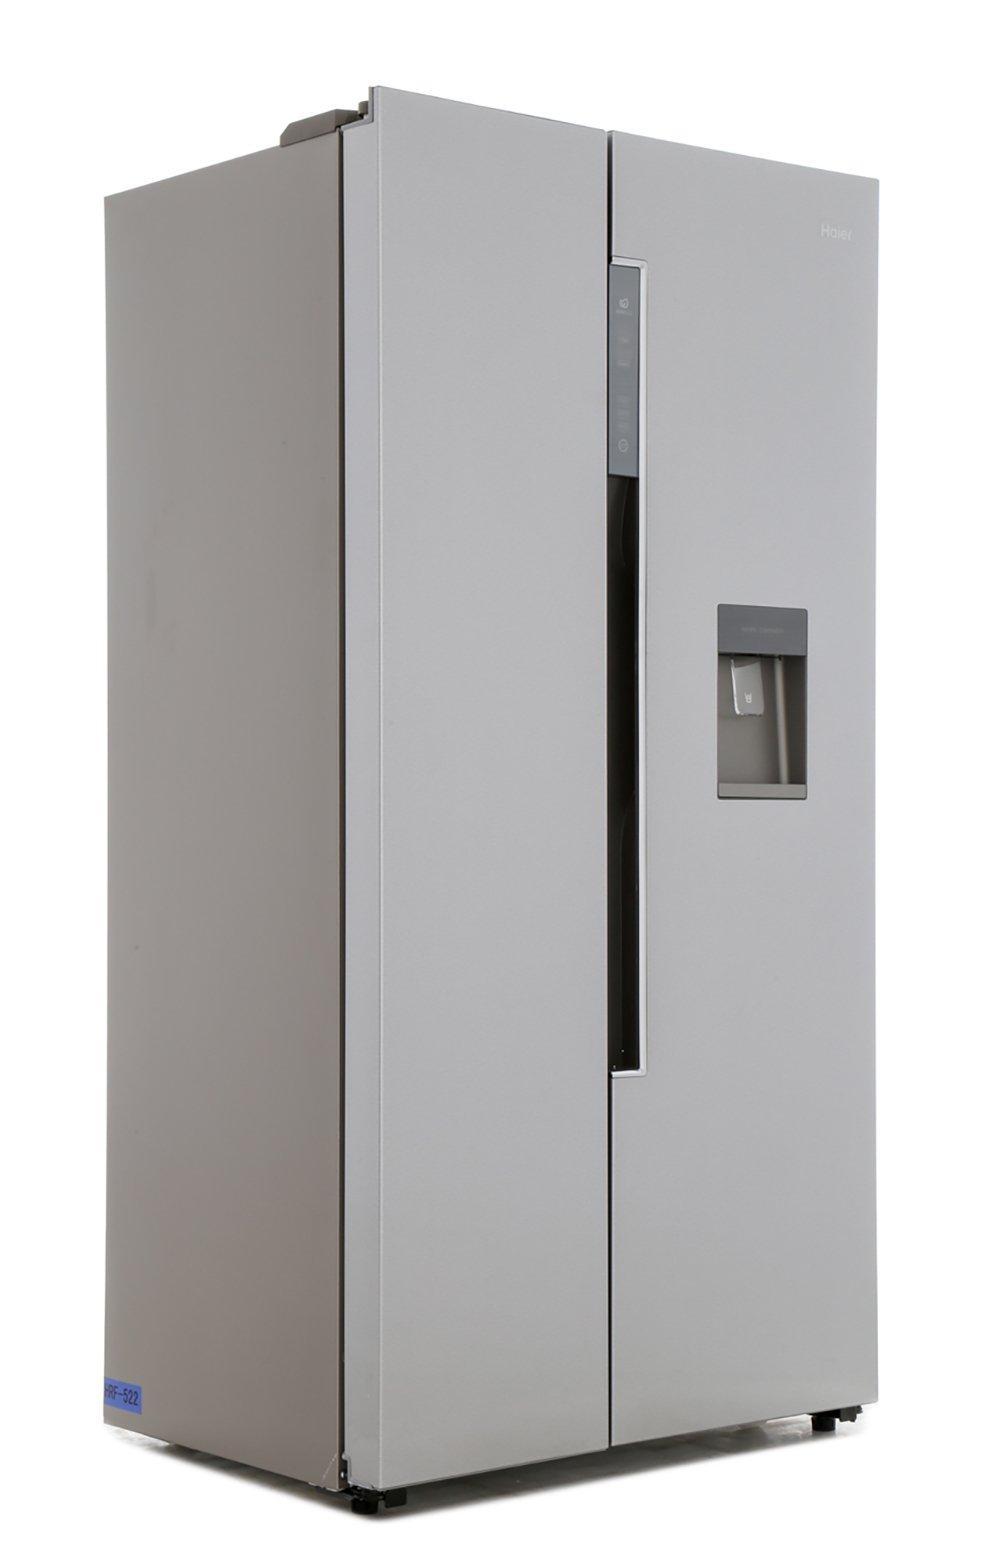 Haier HRF-522WS6 American Fridge Freezer